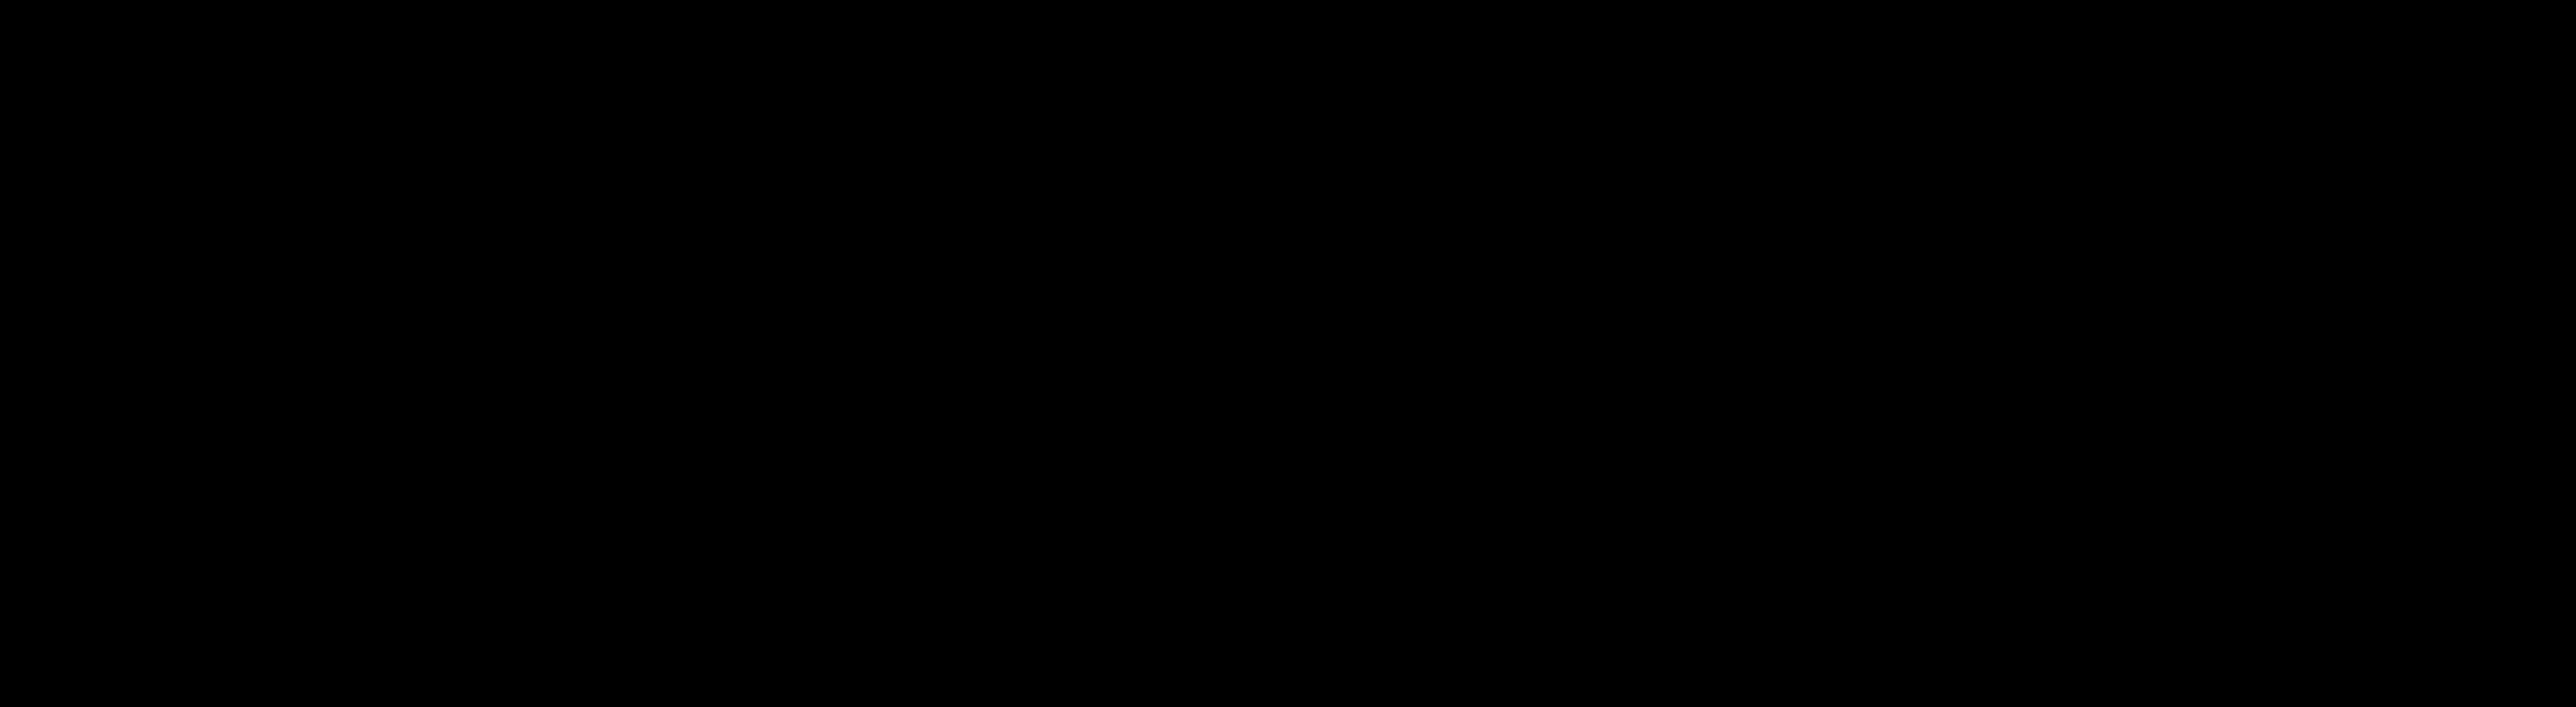 Blackandwhite,Photographic Film,Film